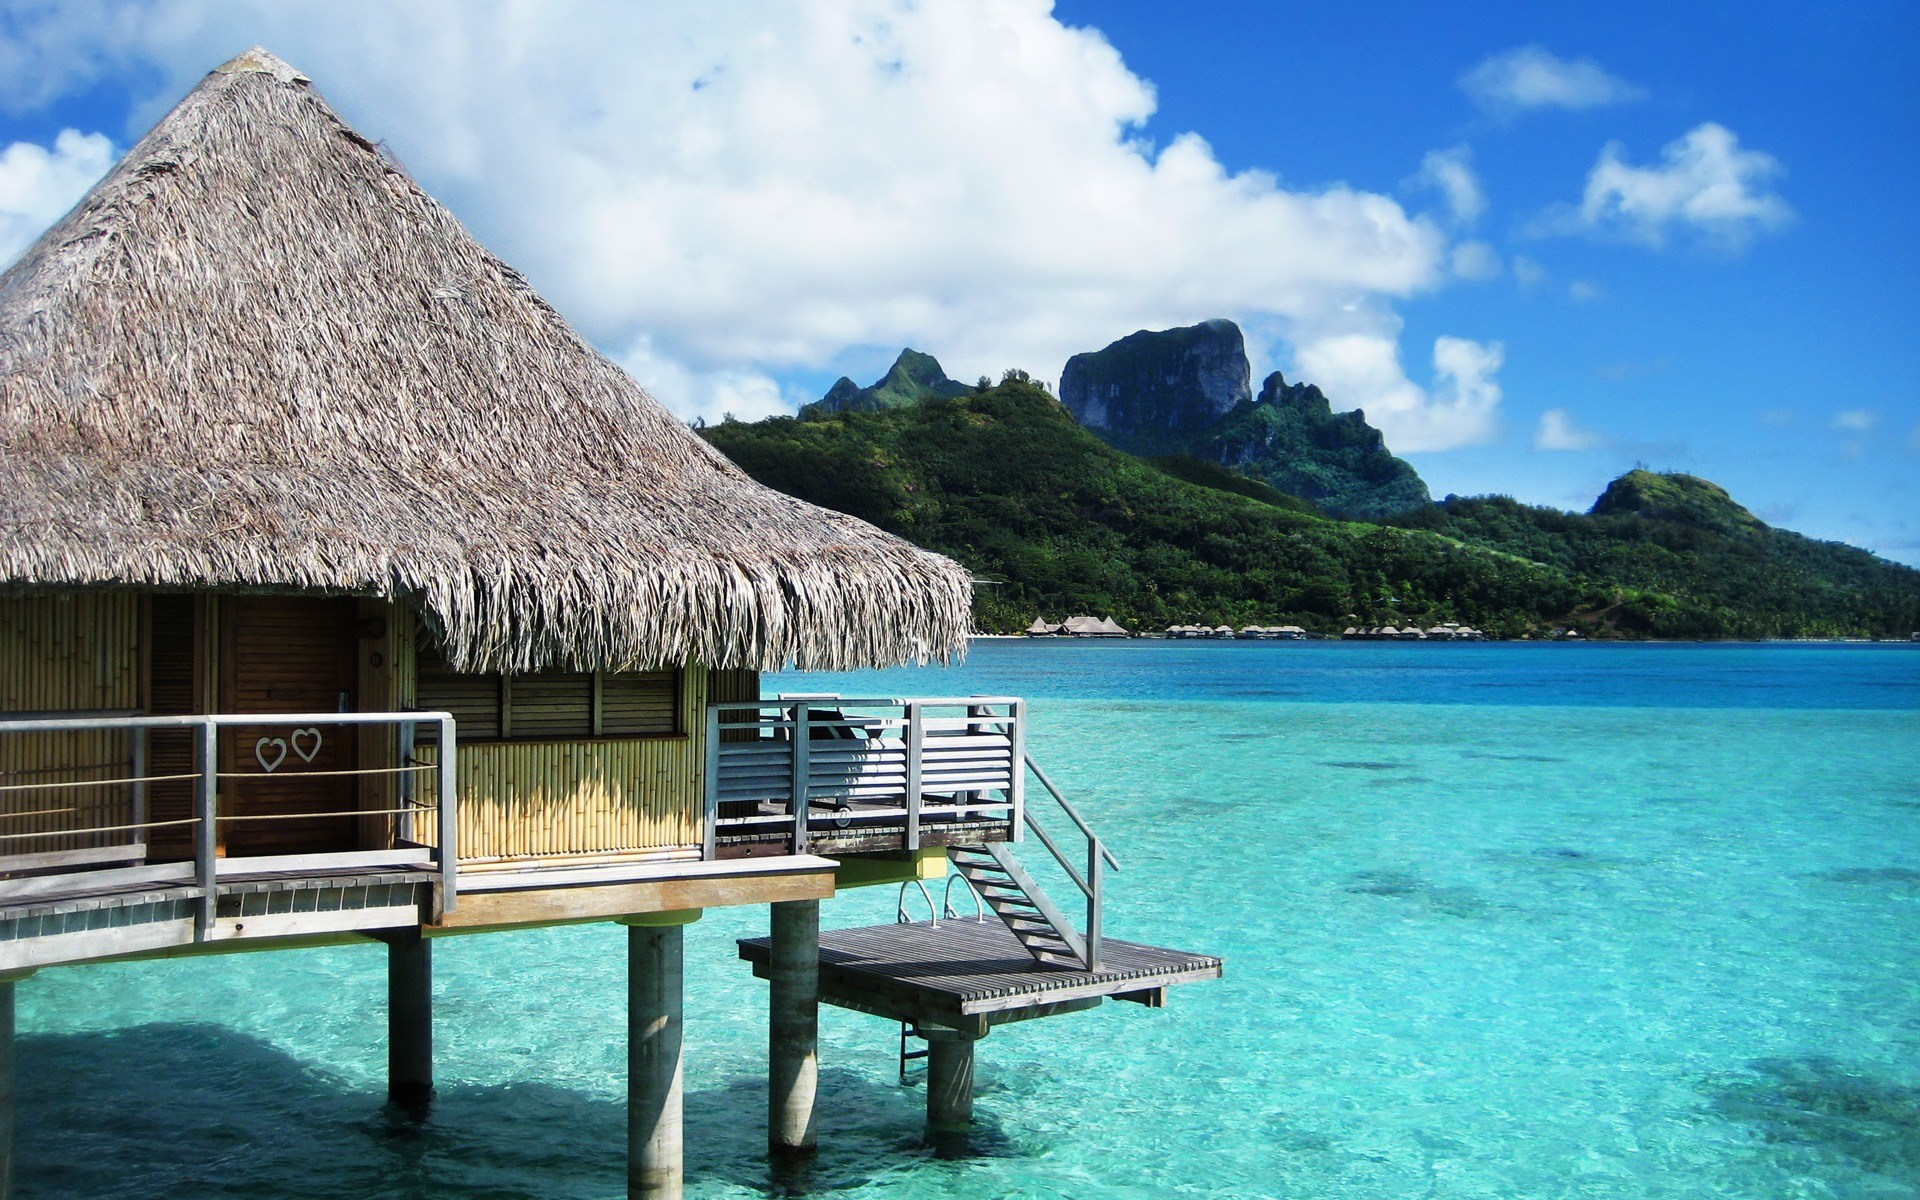 Bora Bora Bungalows 4k Hd Desktop Wallpaper For Wide: Bora Bora, Un Paraíso En La Polinesia Francesa